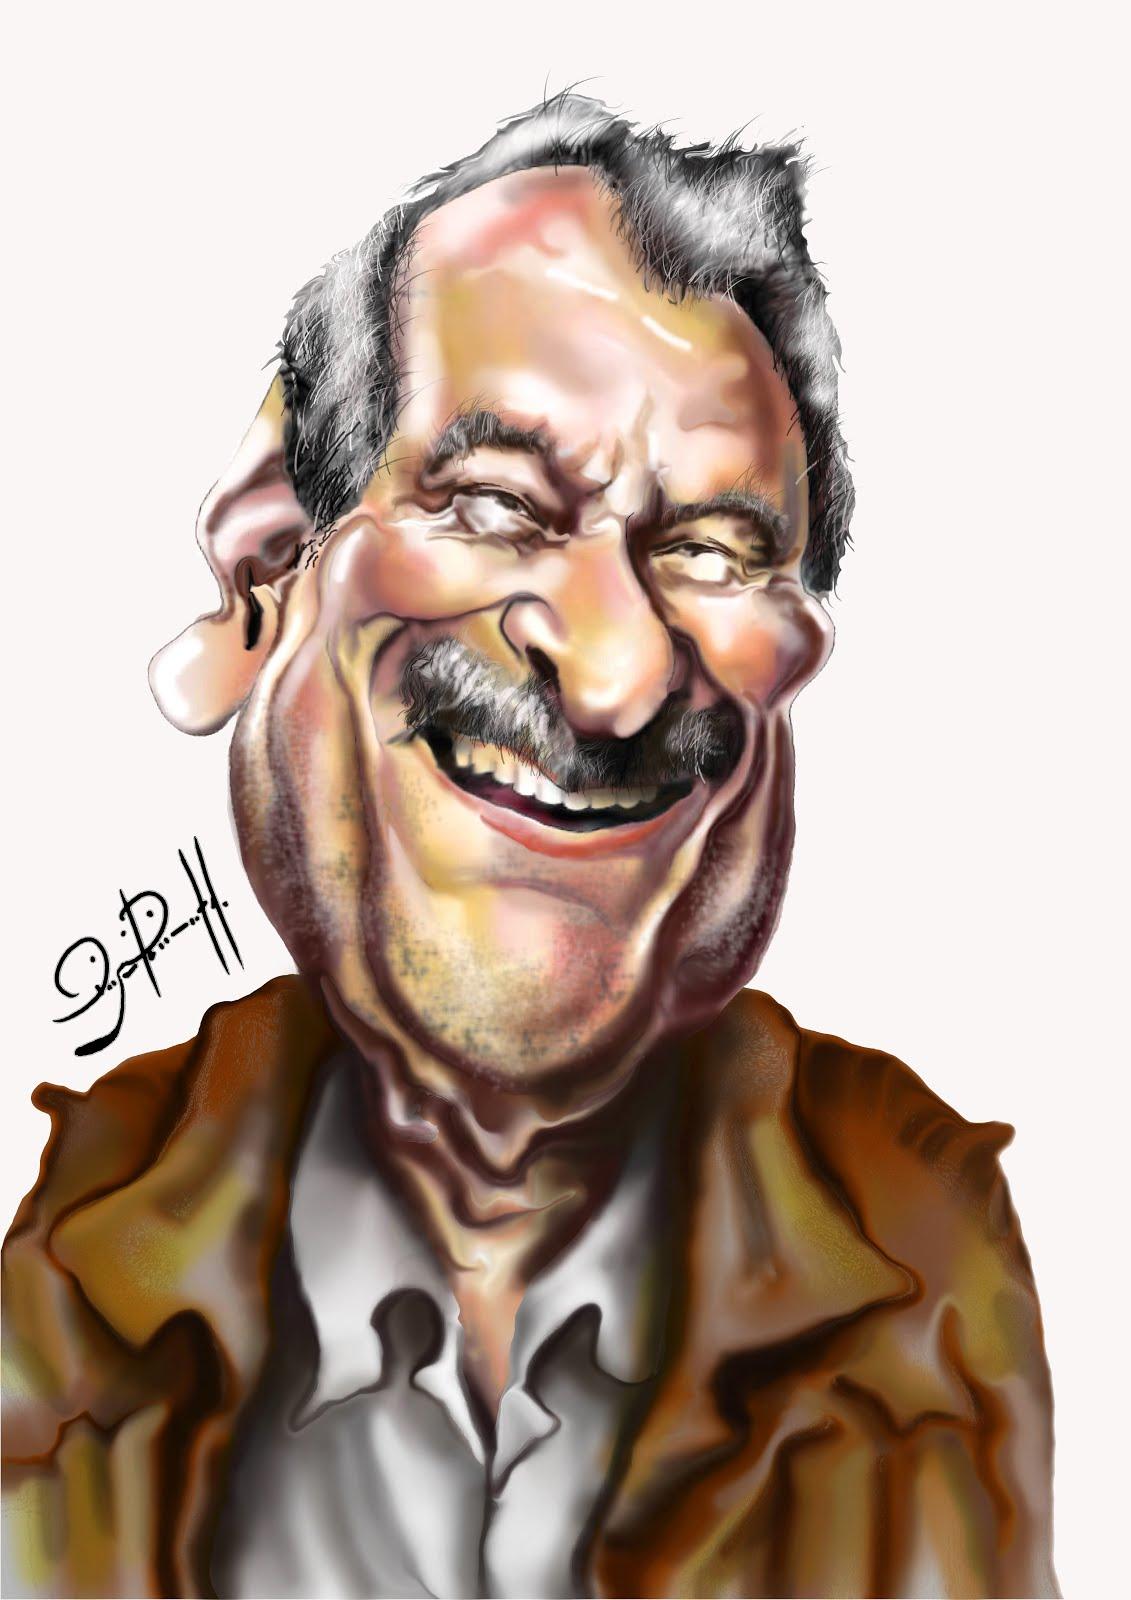 Ator Paulo Goulart_ caricatura digital